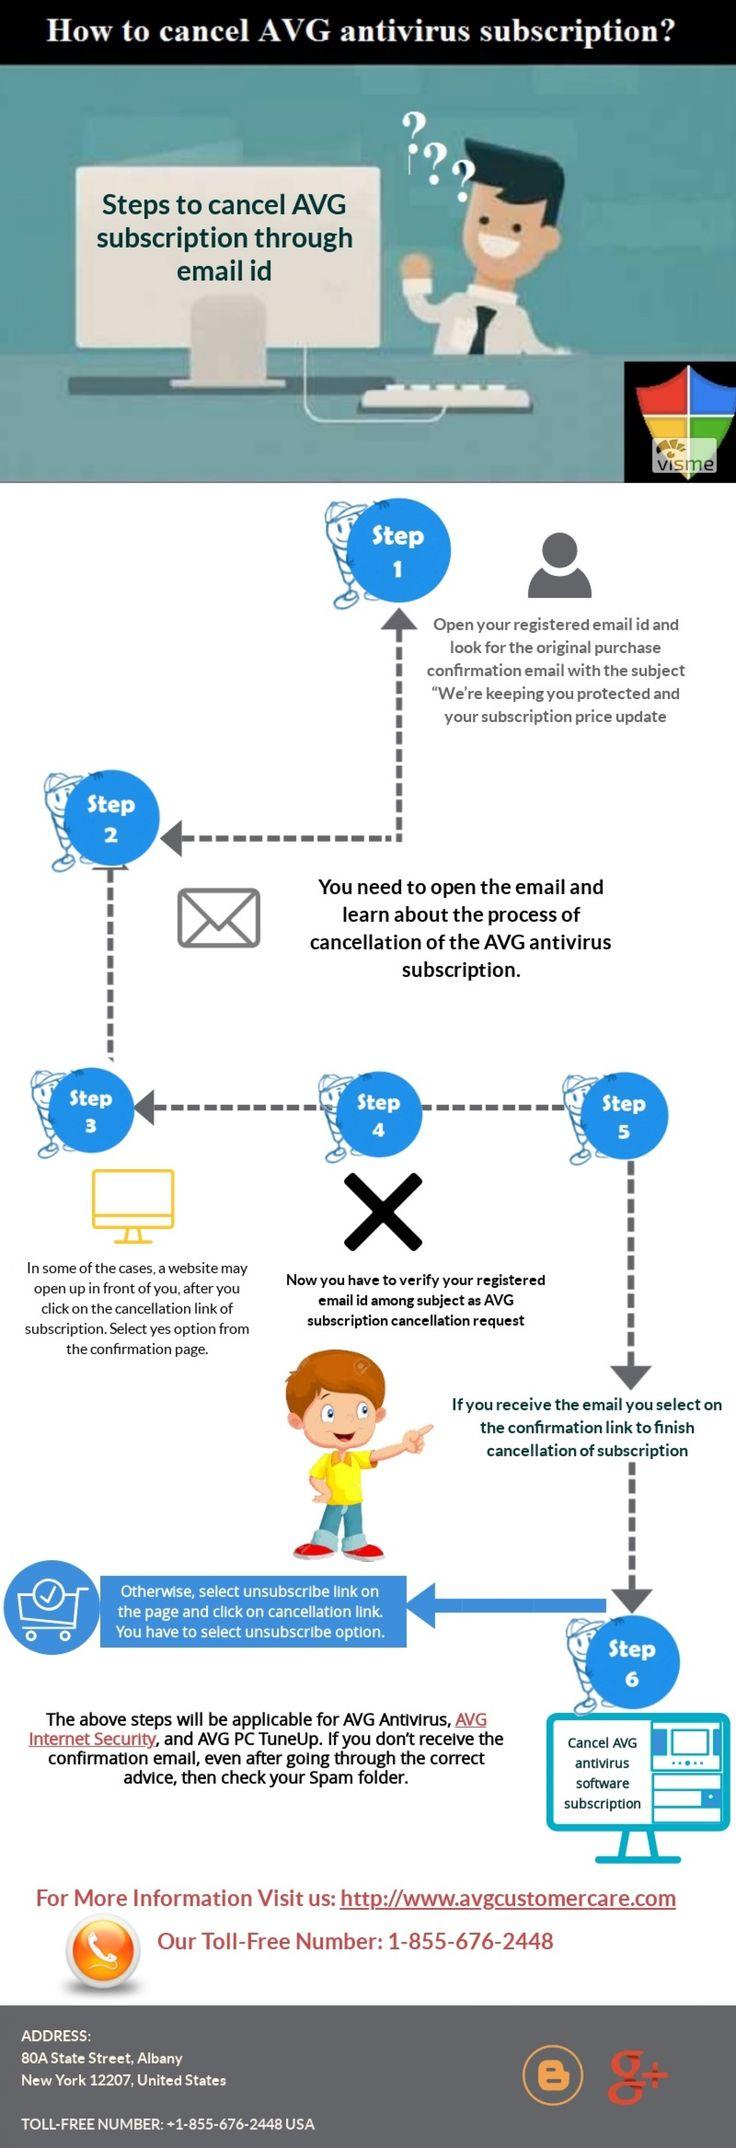 How to cancel avg antivirus subscription via email id